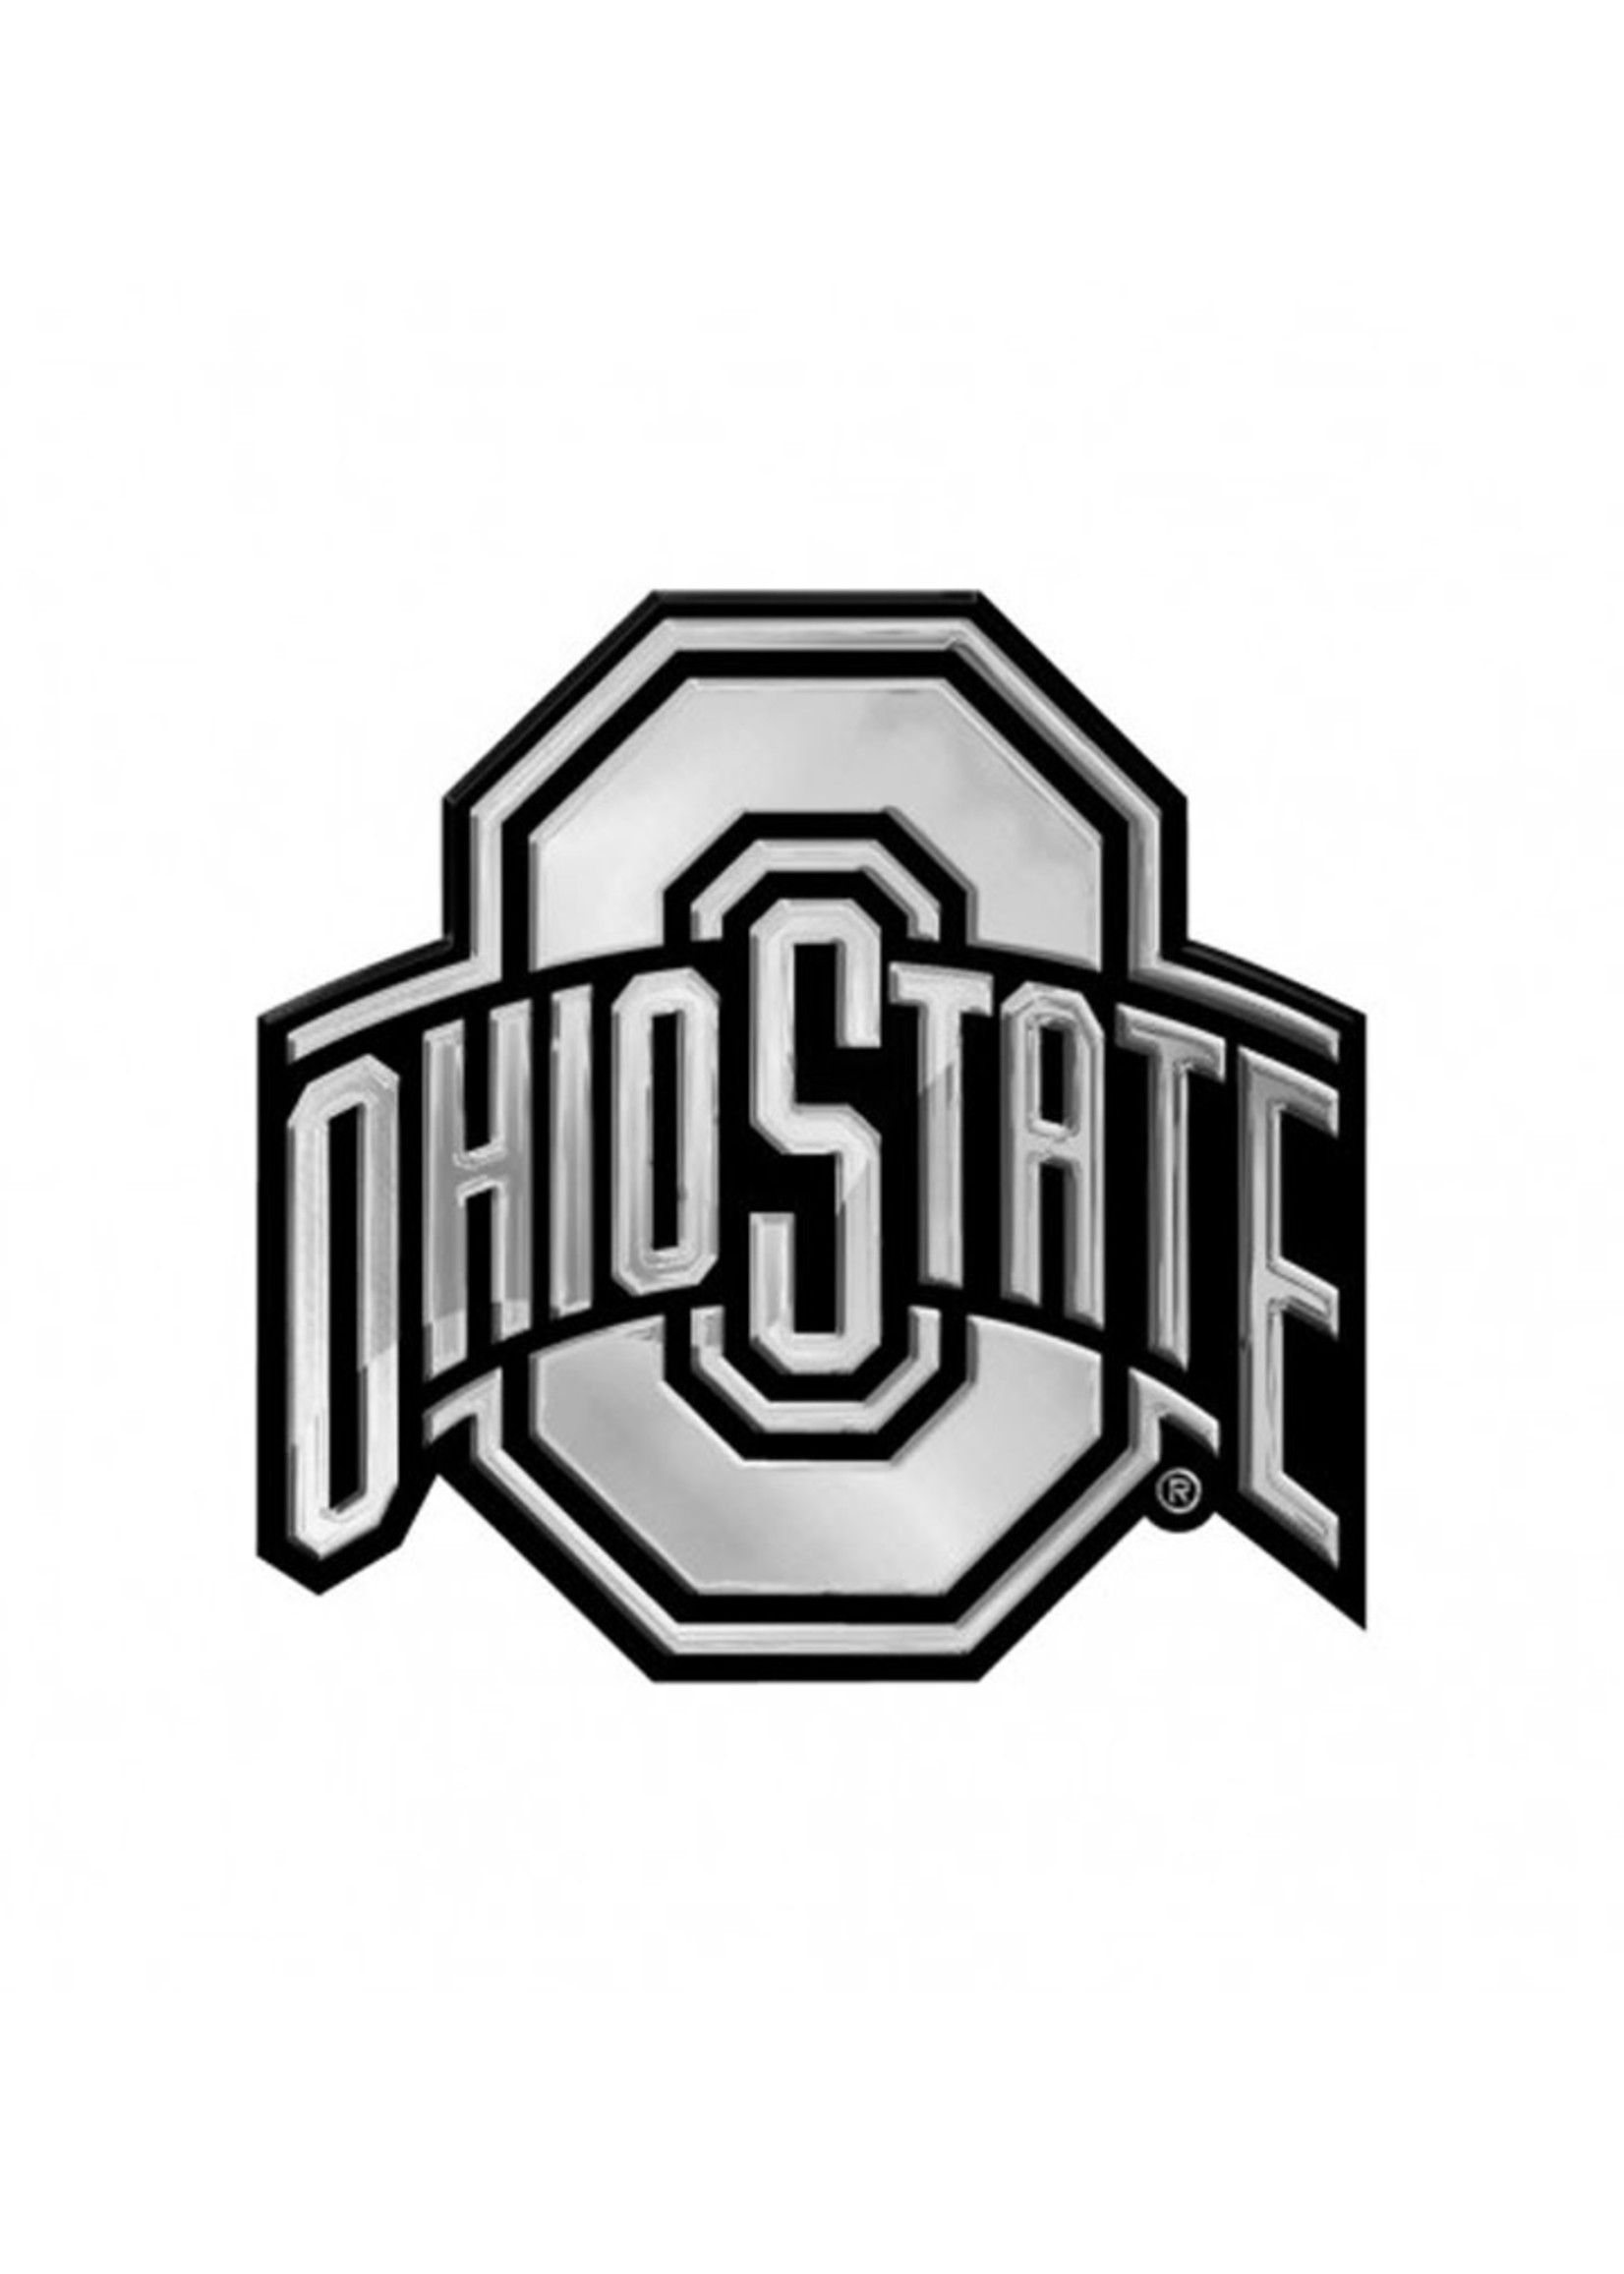 Wincraft Ohio State Buckeyes Acrylic Monochrome Auto Emblem